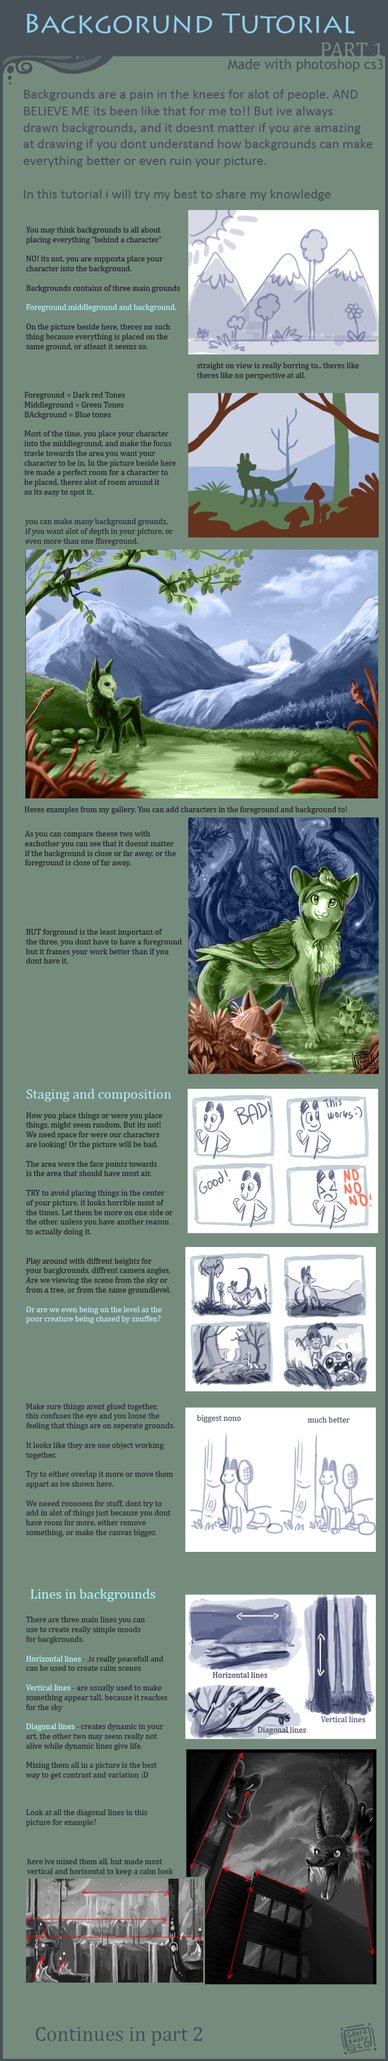 background tutorial part1 by griffsnuff